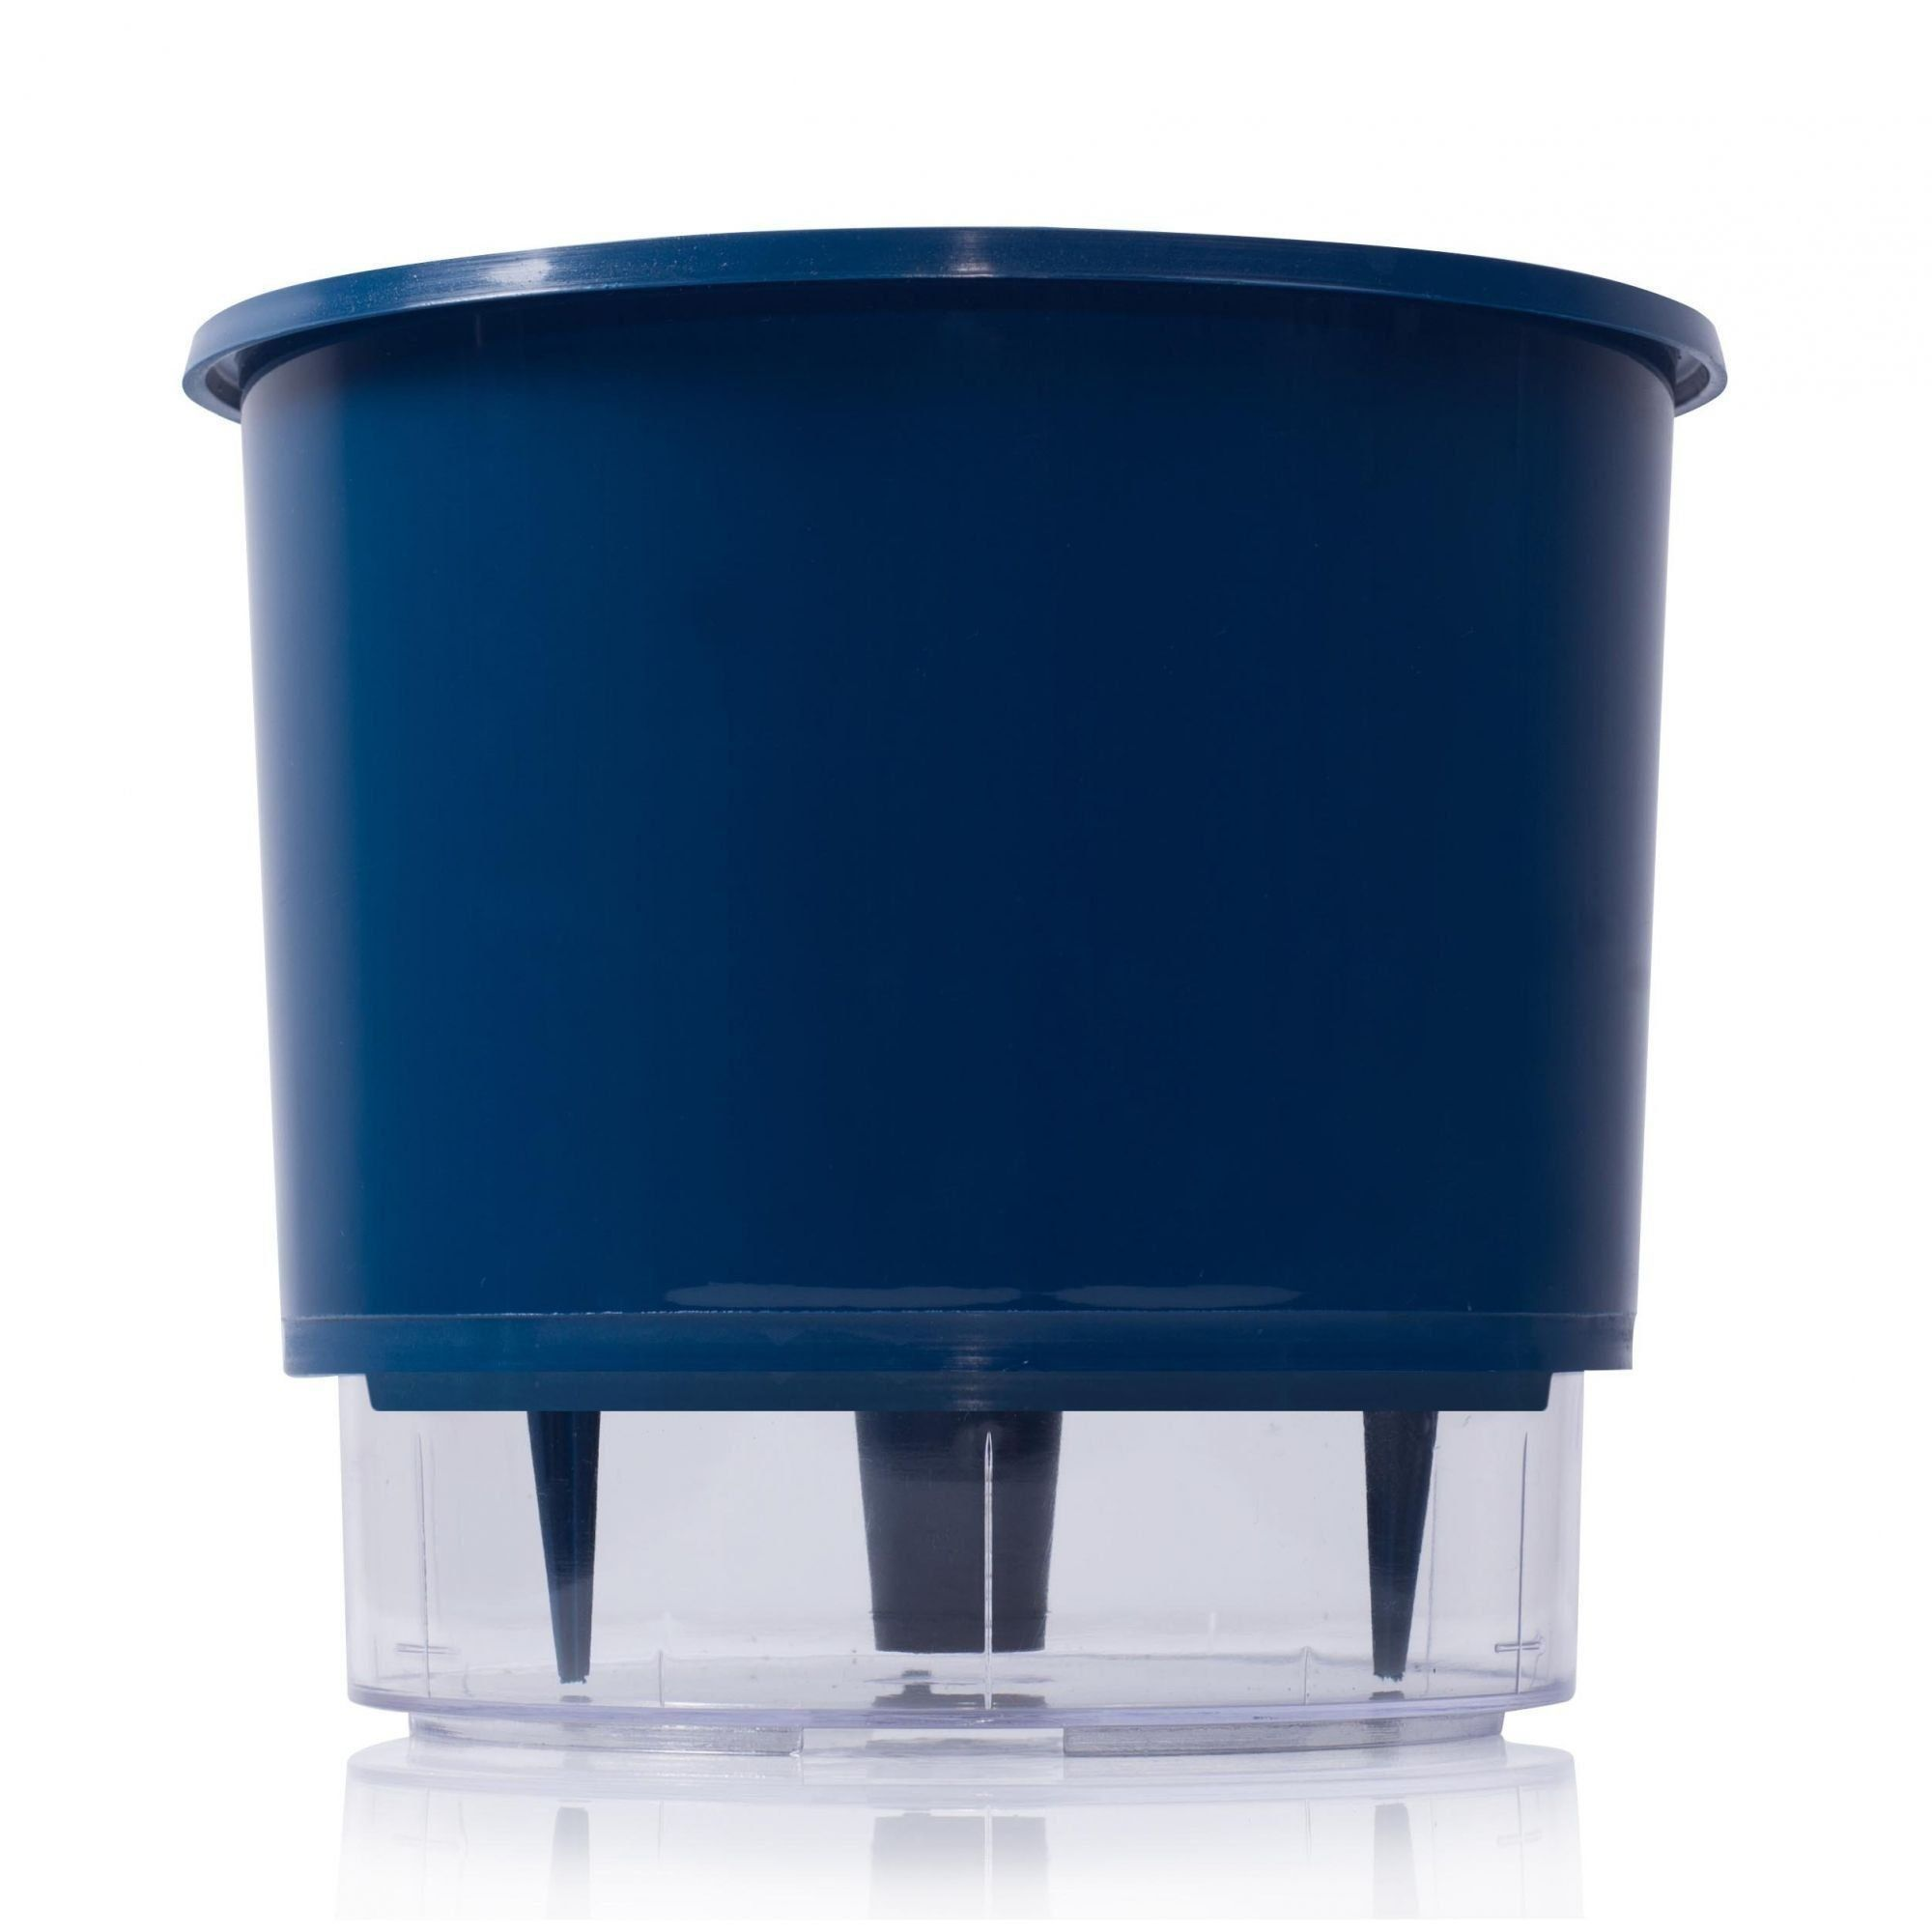 Vaso auto irrigável Raiz MÉDIO N03 16 cm X 14 cm Azul Escuro